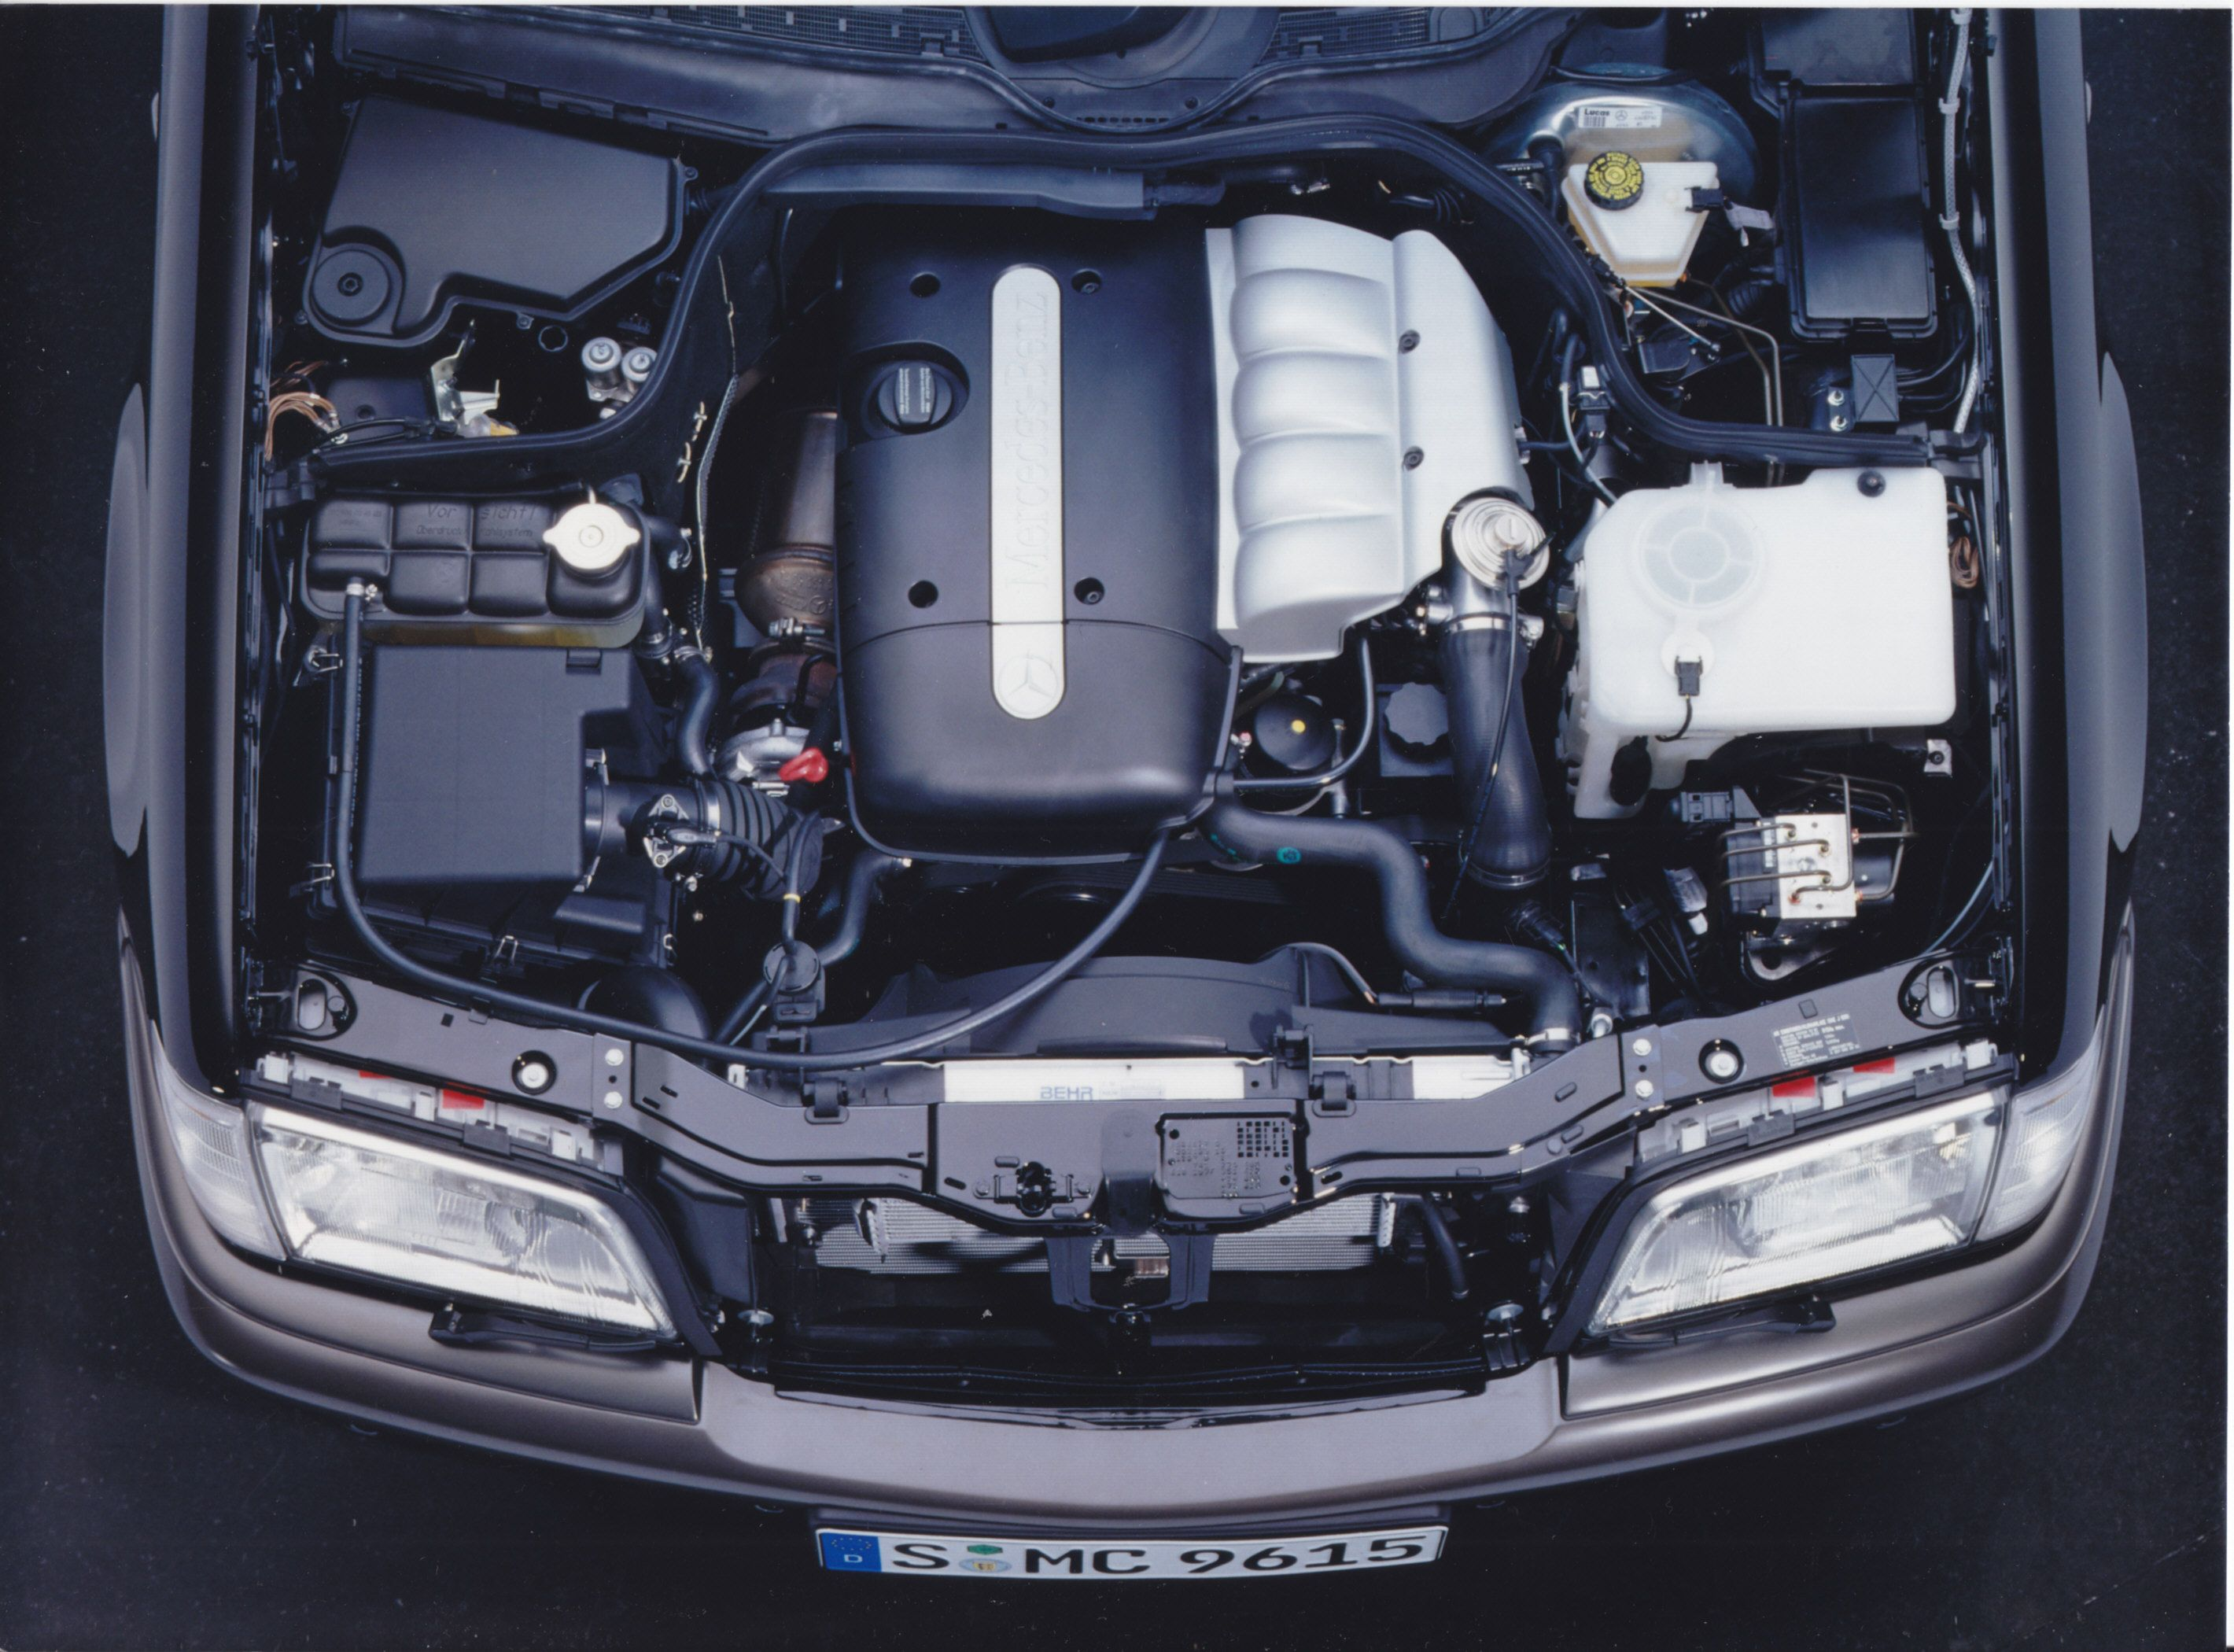 Mercedes Benz C 220 Turbo sel engine A97 F 3688